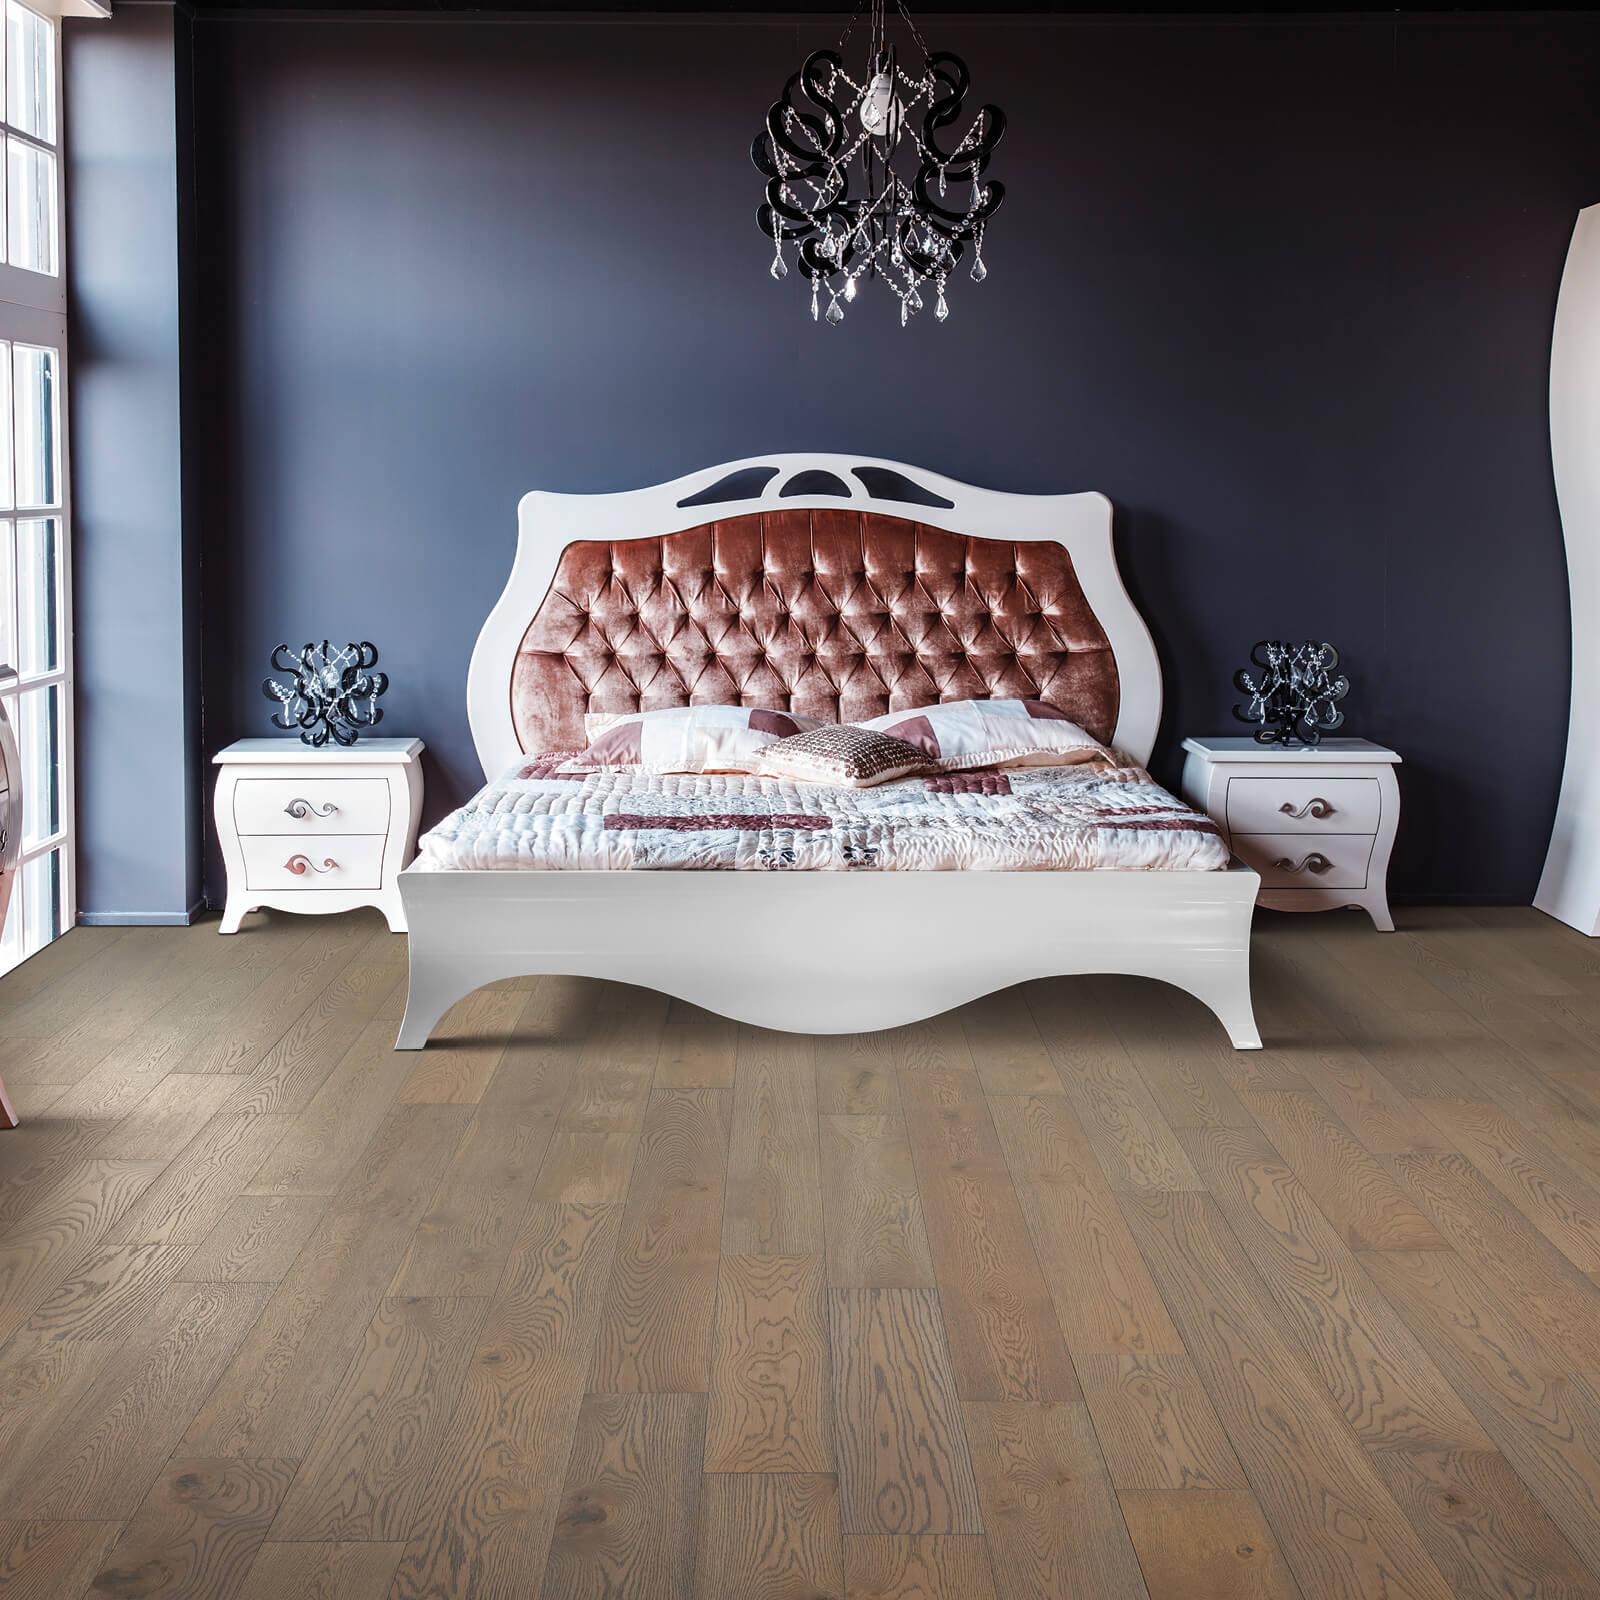 Mohawk hardwood flooring   Dolphin Carpet & Tile